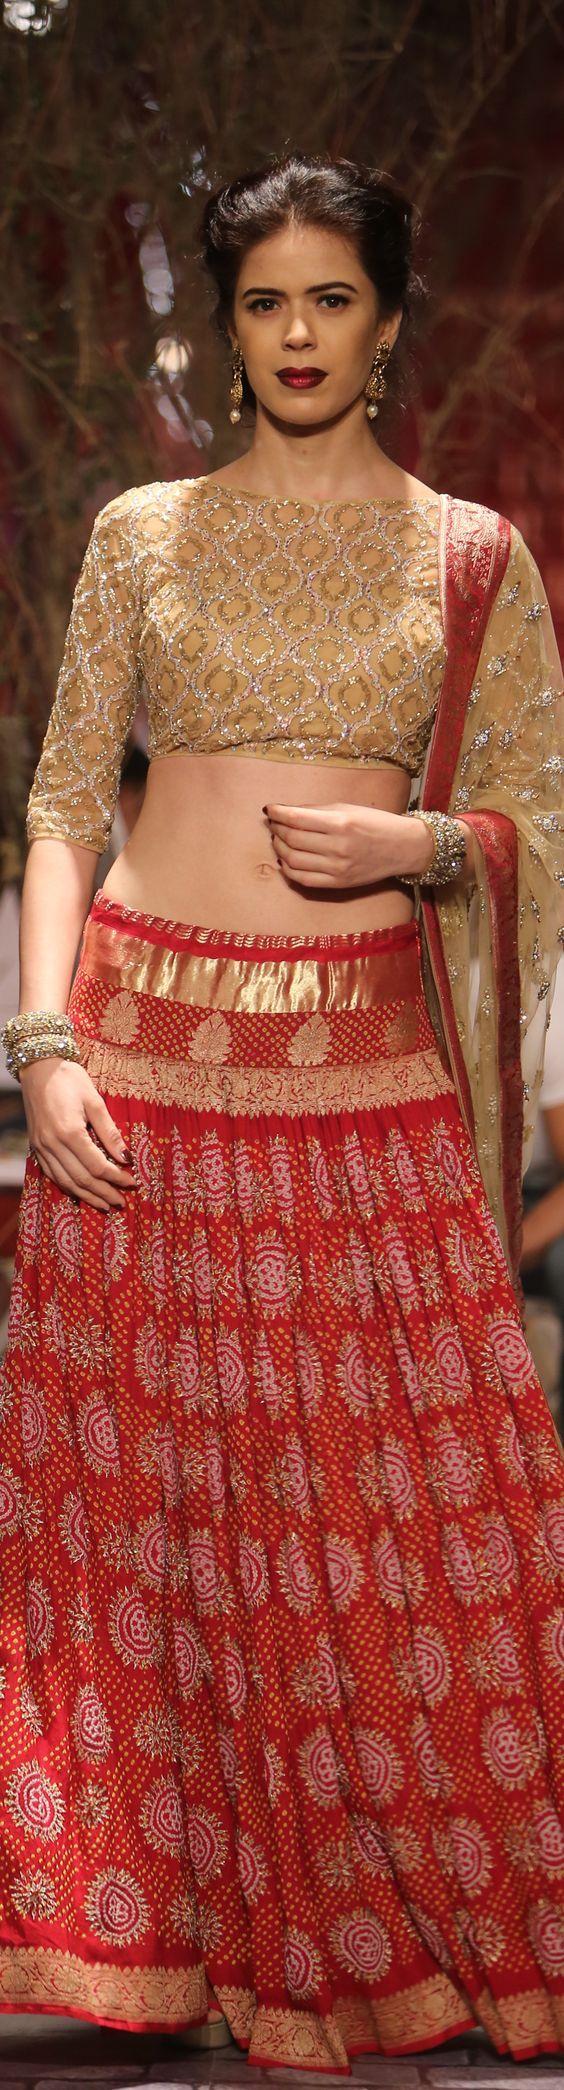 By designer Monisha Jaisingh. Bridelan- Personal shopper & style consultants for Indian/NRI weddings, website www.bridelan.com #Bridelan #weddinglehenga #MonishaJaiSingh #MonishaJaiSinghweddingLehenga